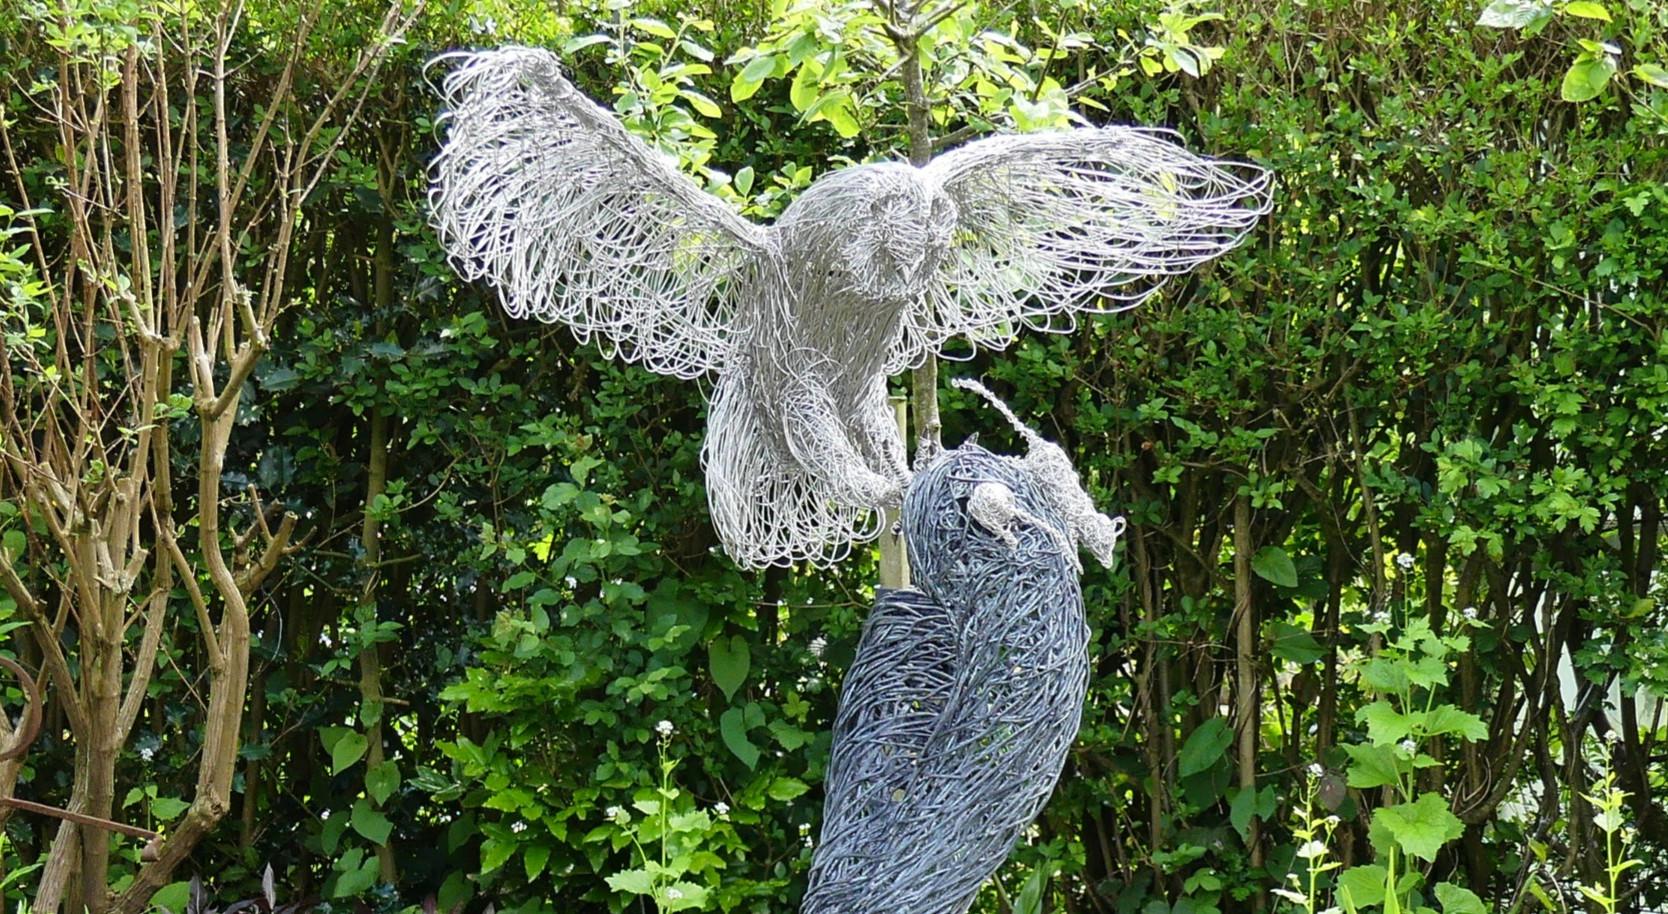 Owl Landing - stainless steel